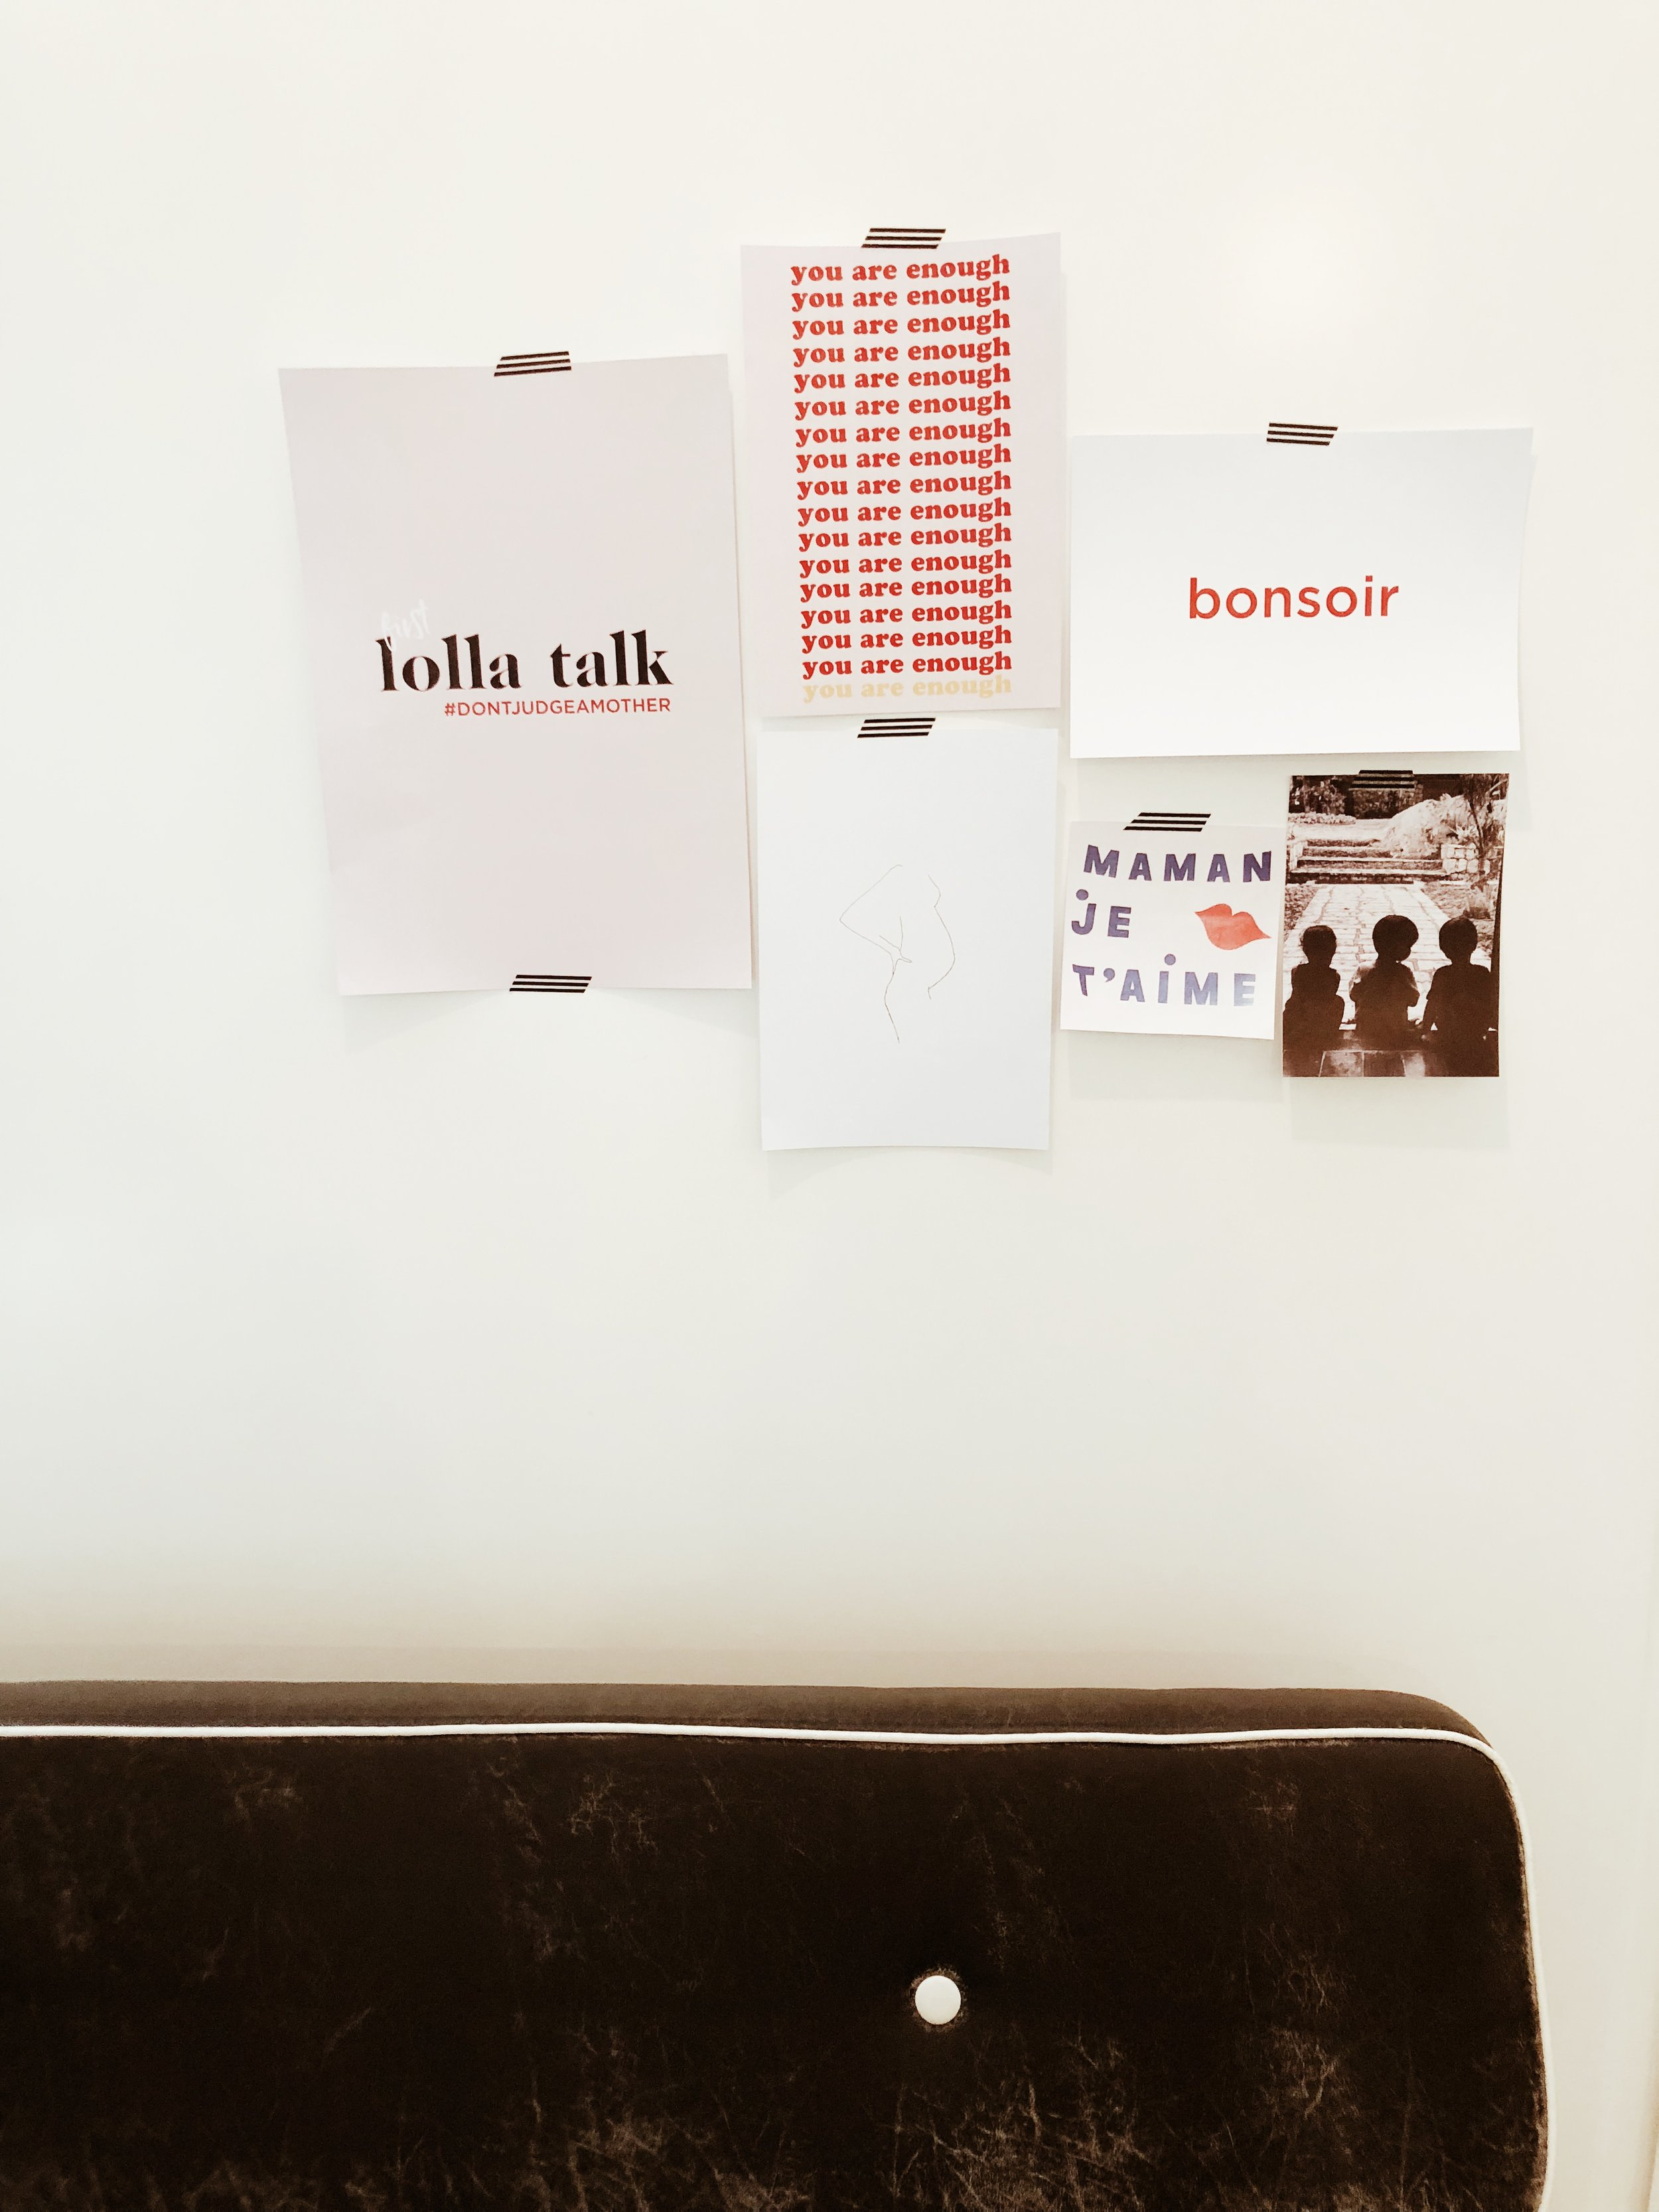 E601733D 5506 4452 9FF5 ABC74444A27C - Lolla Talks: Os Melhores Momentos